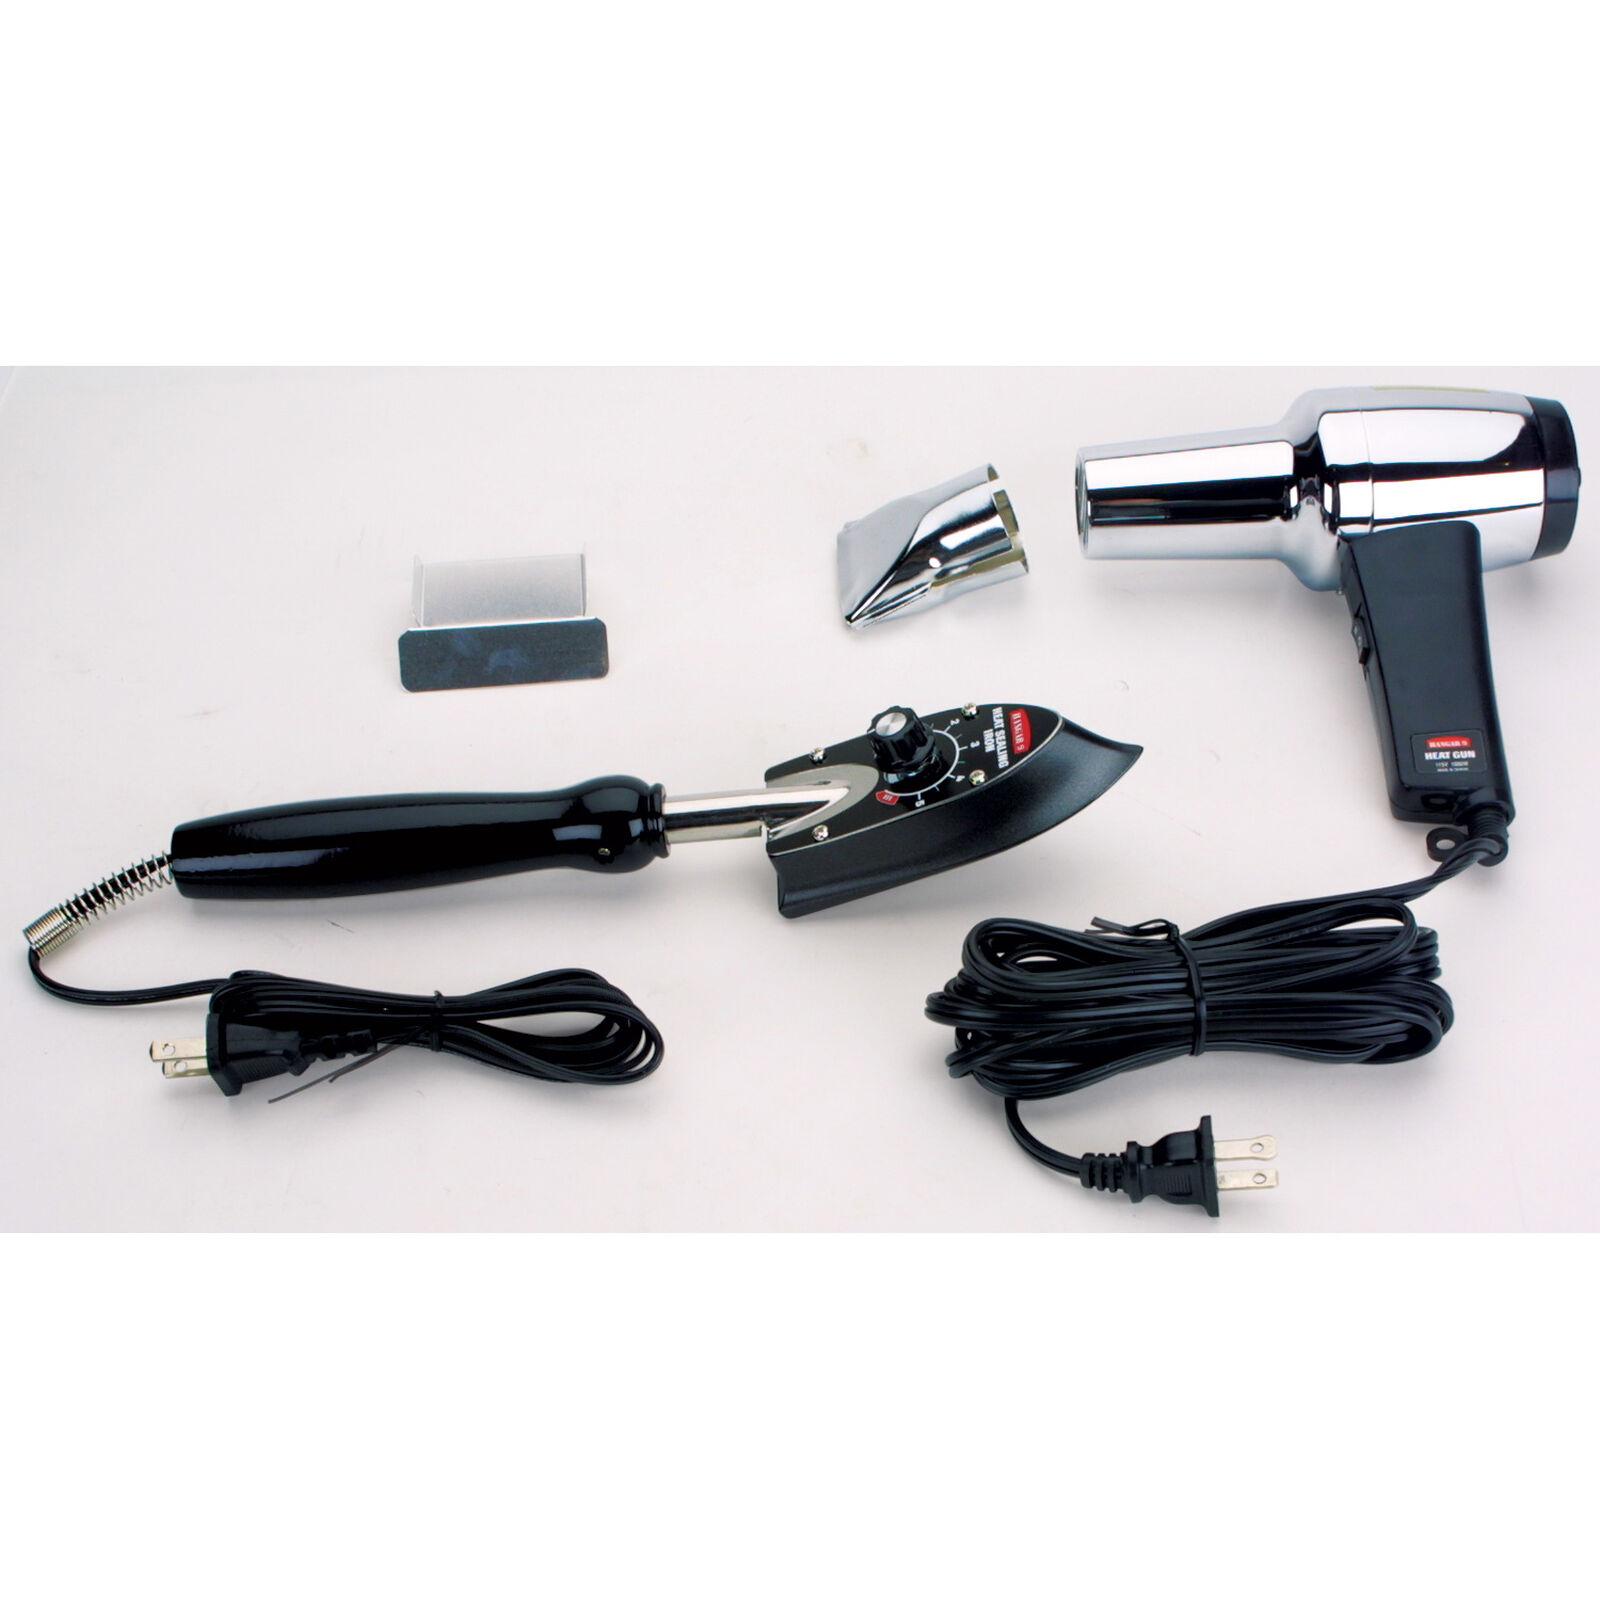 Heat Gun/Sealing Iron Combo